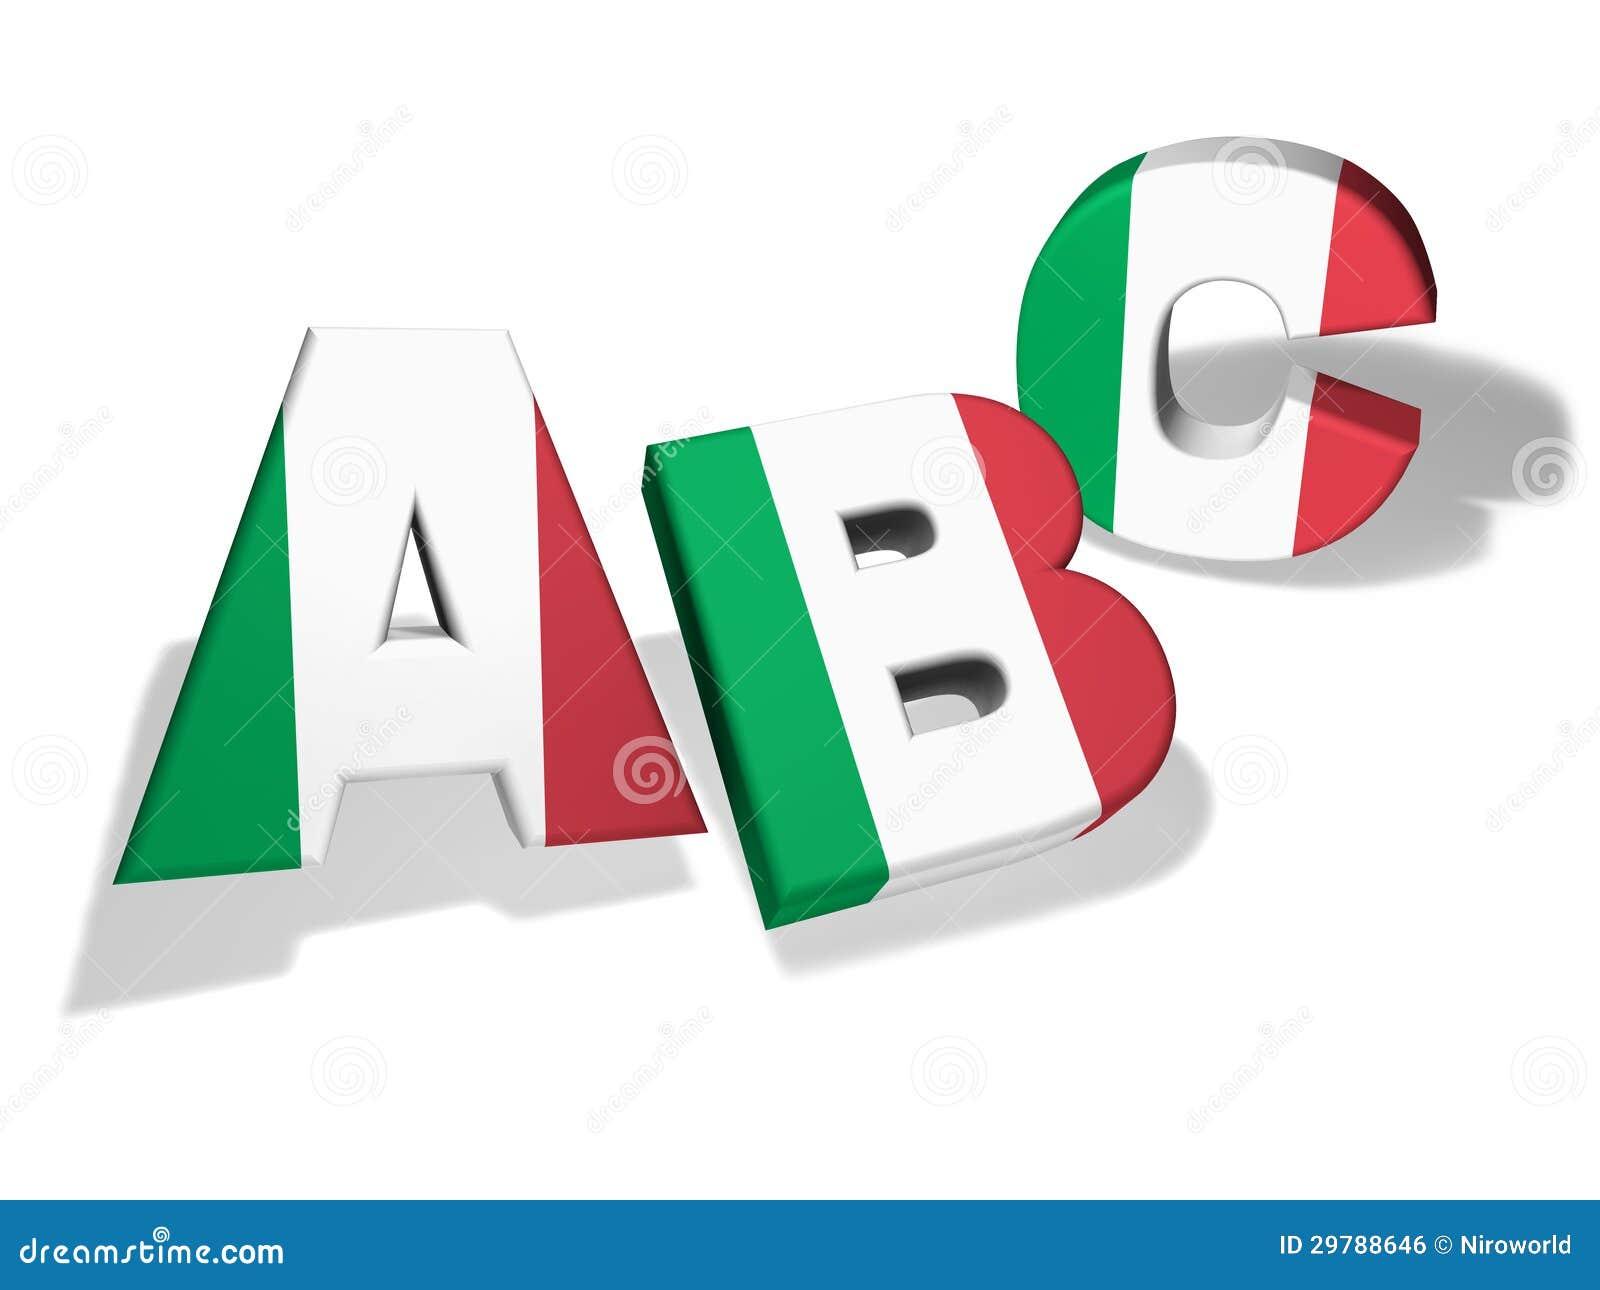 English In Italian: Abc Italian School Concept Royalty Free Stock Image